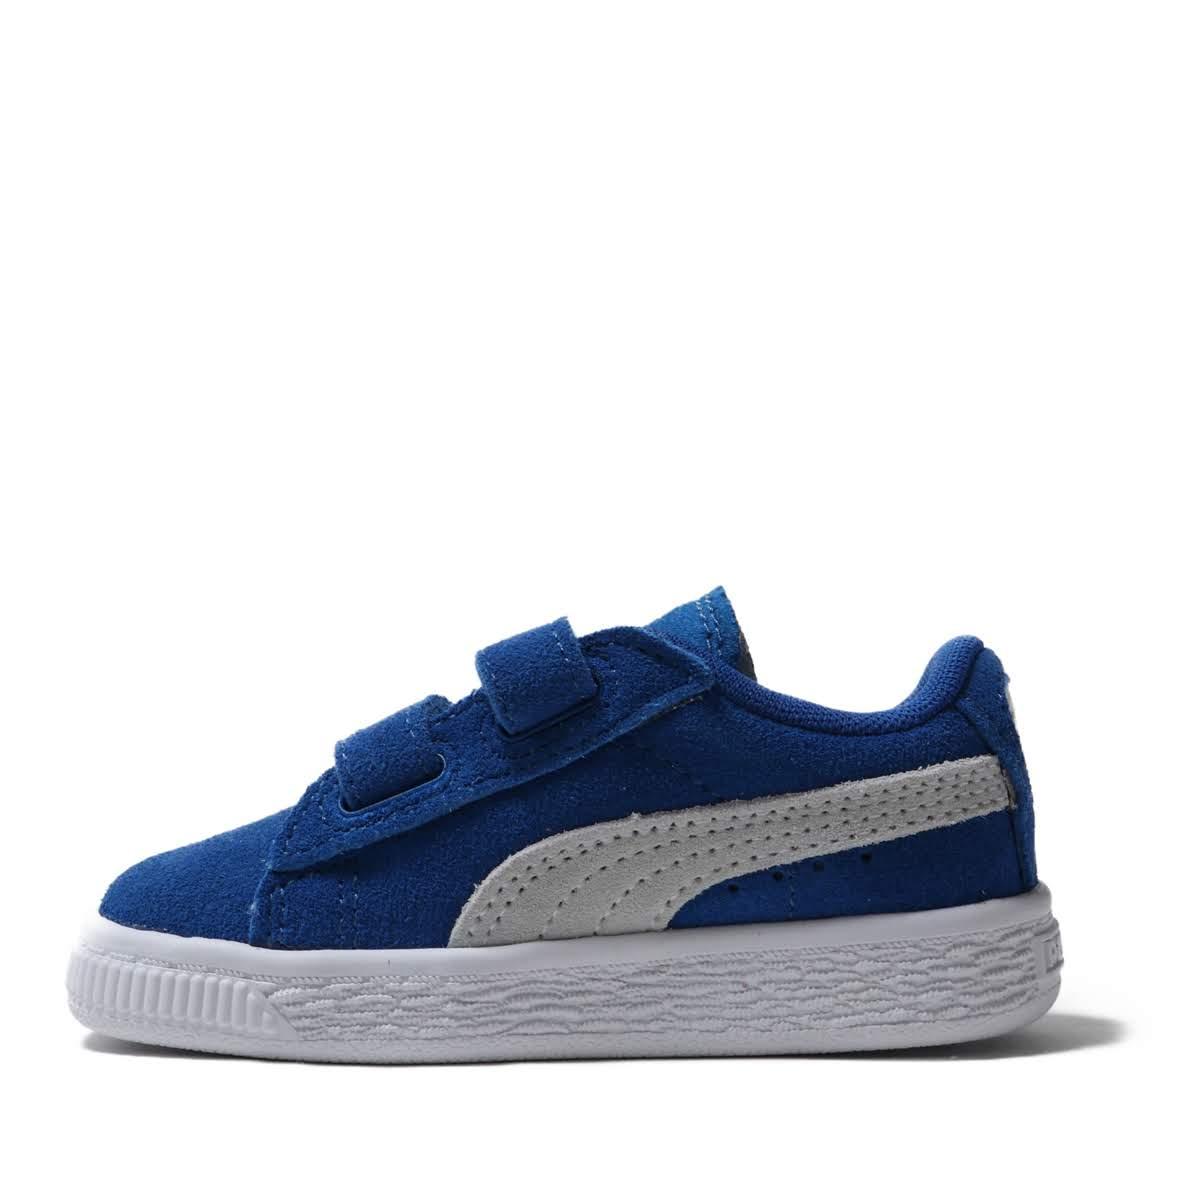 PUMA SUEDE 2 STRAP KIDS (Puma suede cloth 2 strap kids) 02SNORKEL BLUE 19SU I